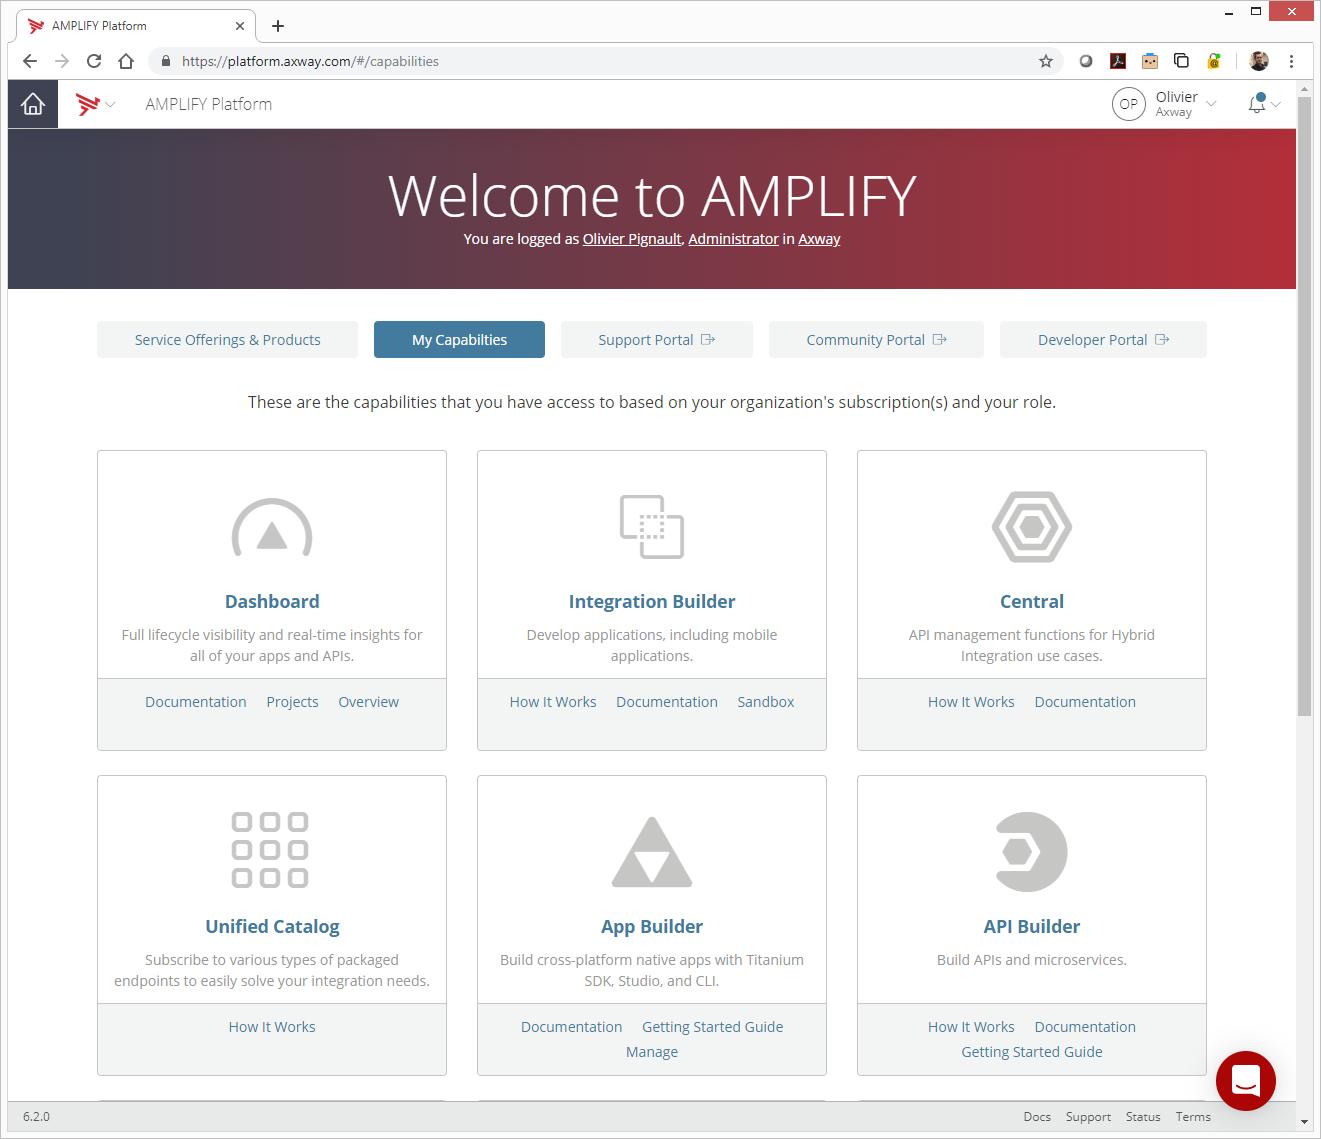 AMPLIFY Platform Home Page - Capabilities